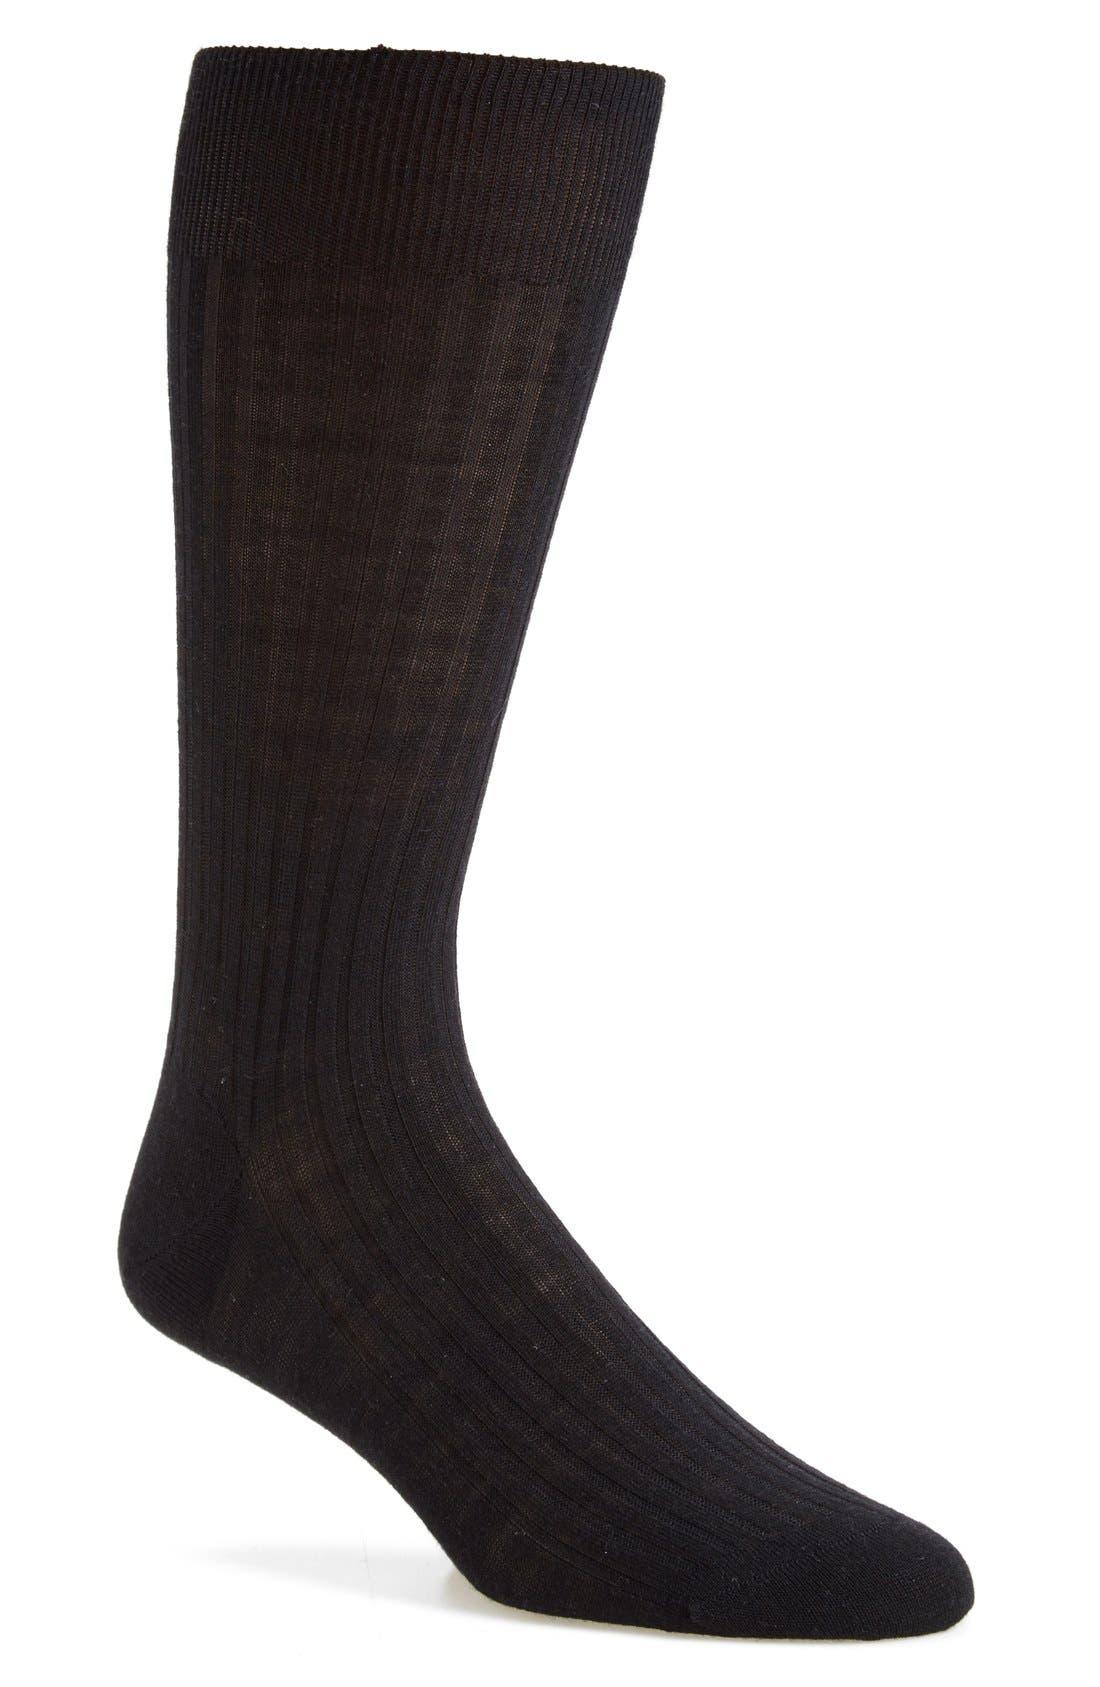 Merino Wool Blend Socks,                             Main thumbnail 1, color,                             BLACK